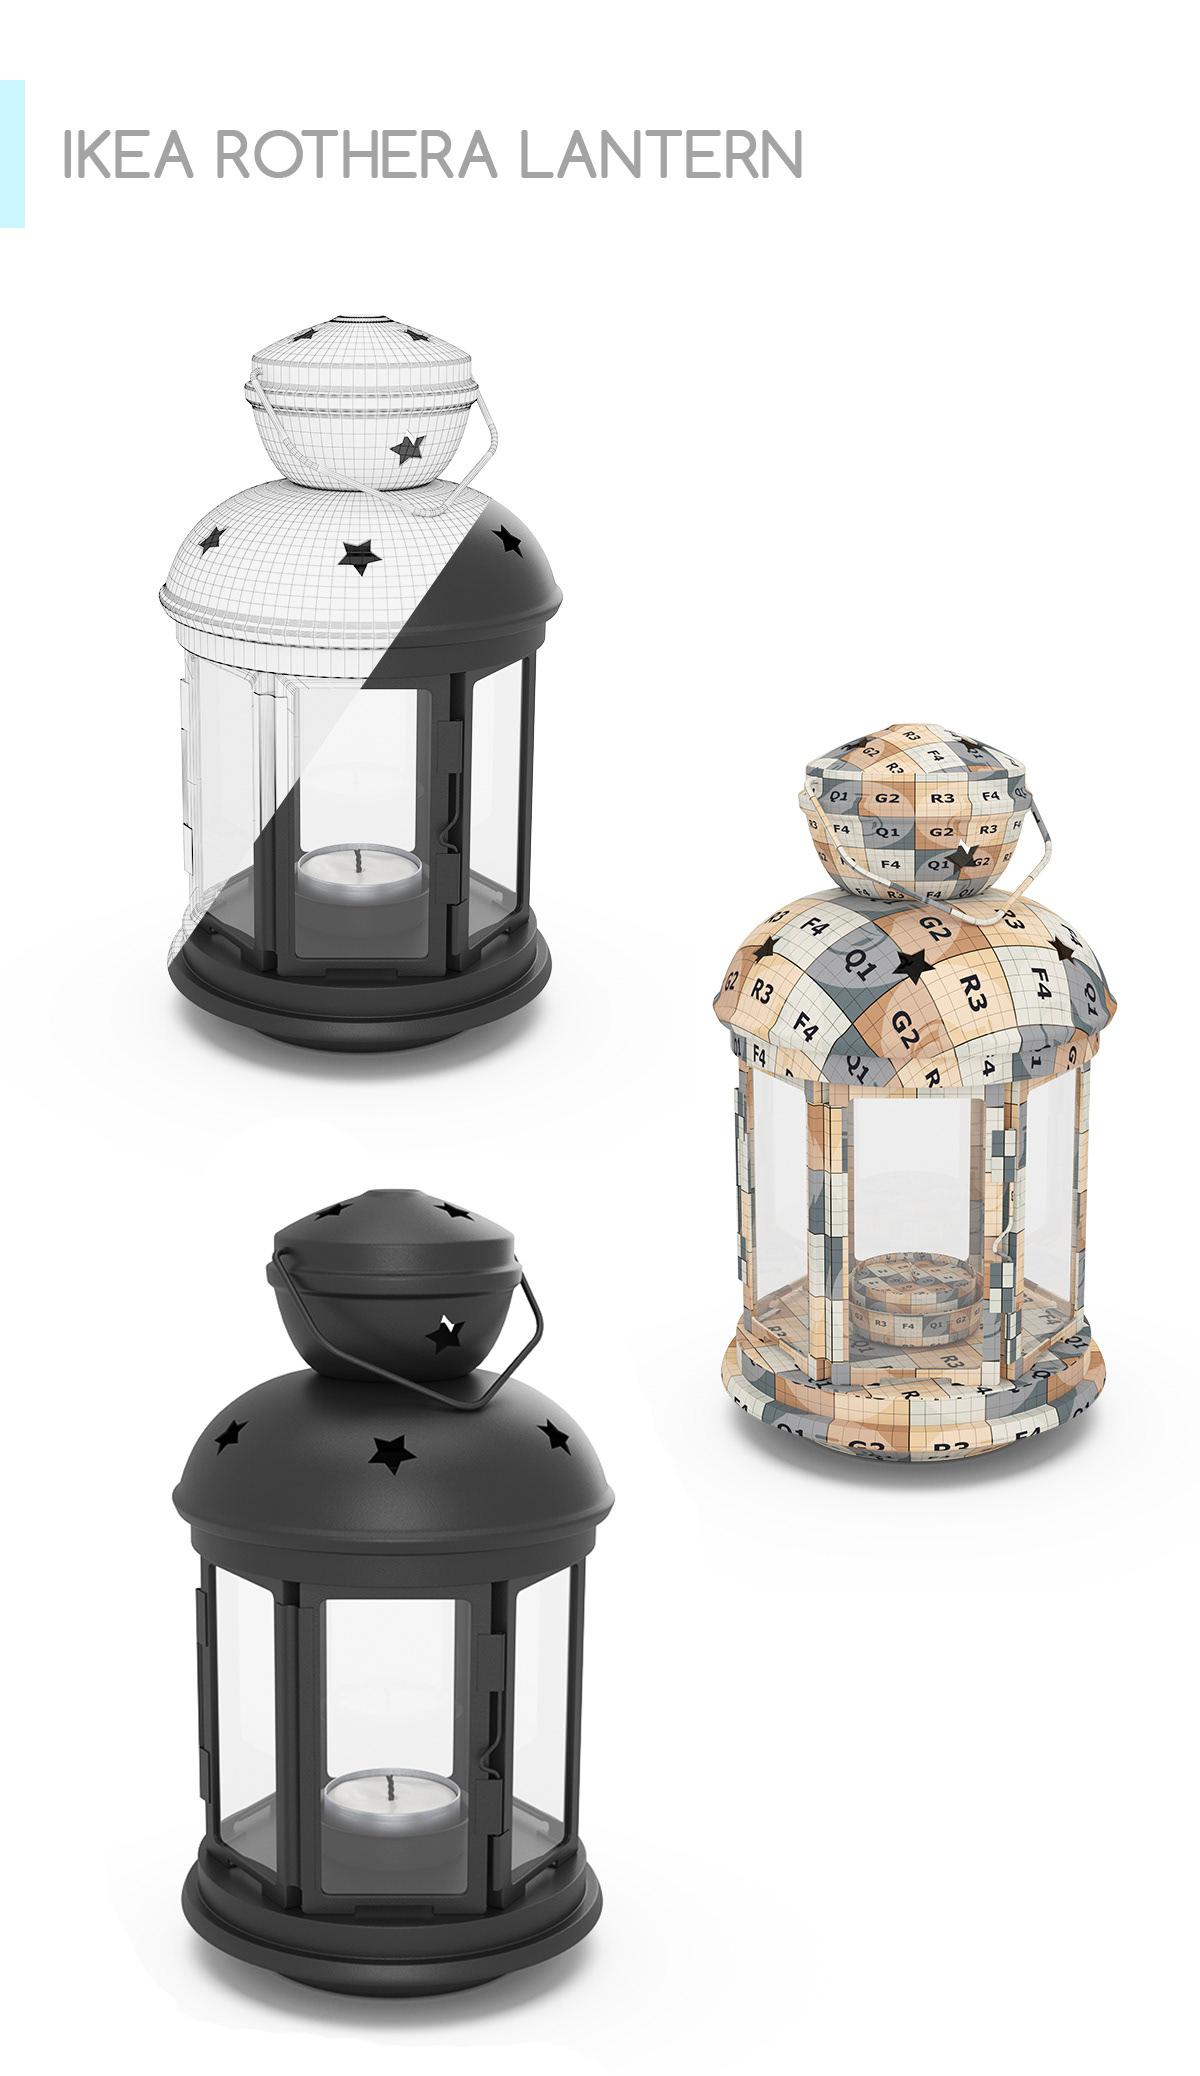 3d lab academy 3d Models concrete pendant lamp download free Grey Bliss Teapot 3D free 3d models freebie ikea